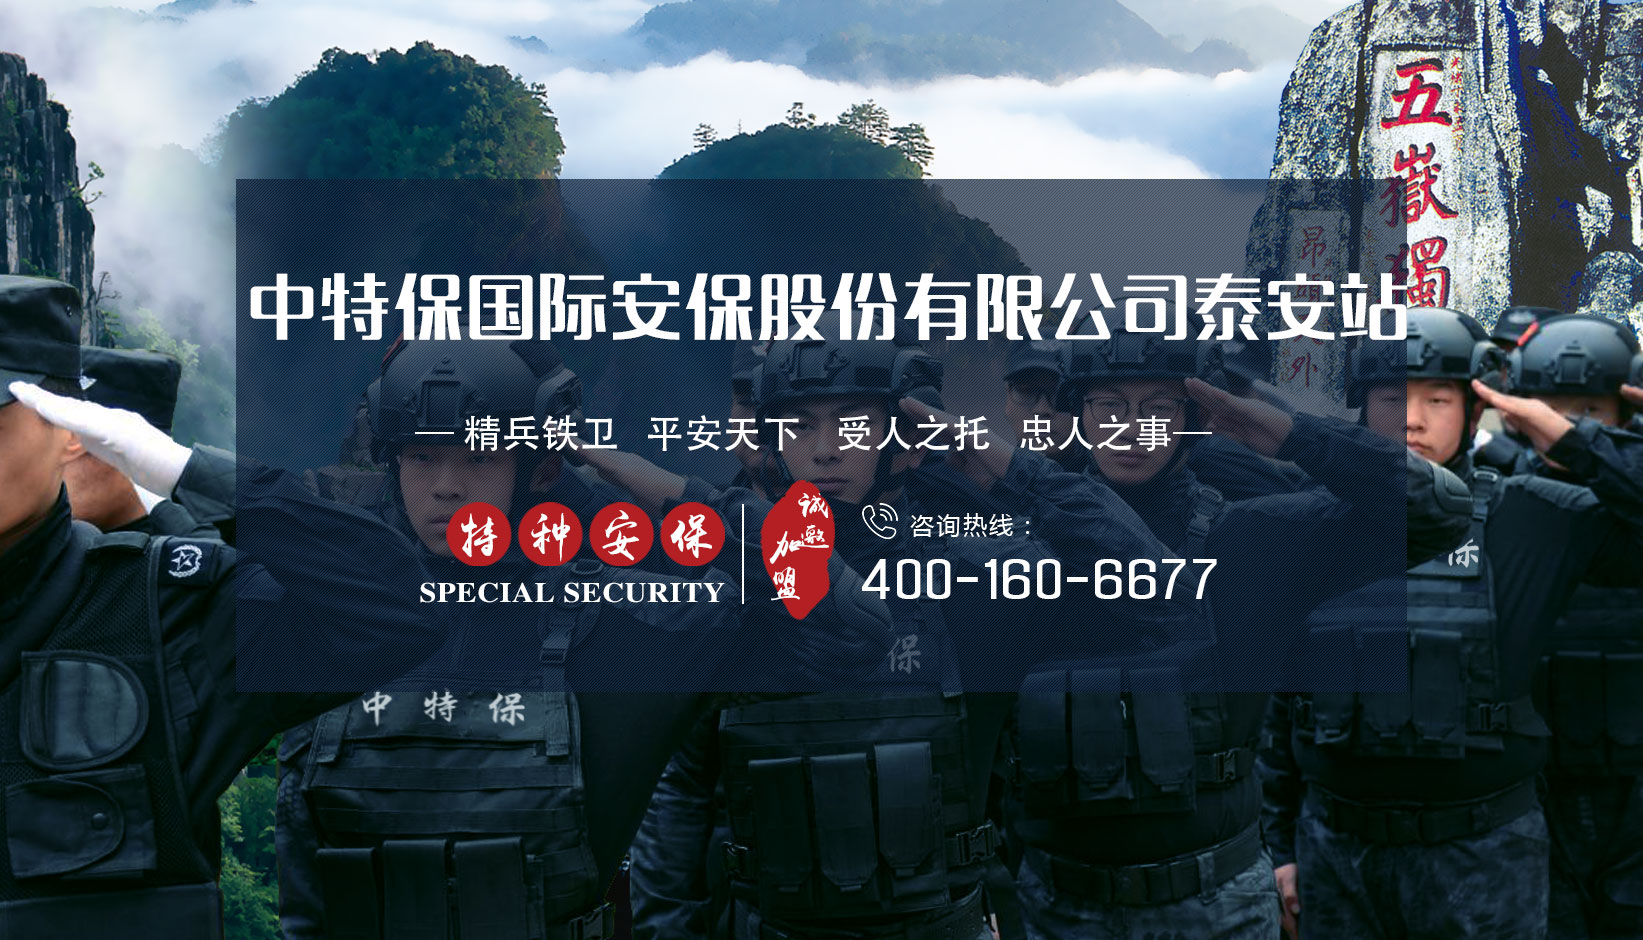 http://www.tazhongtebao.com/html/infomation/